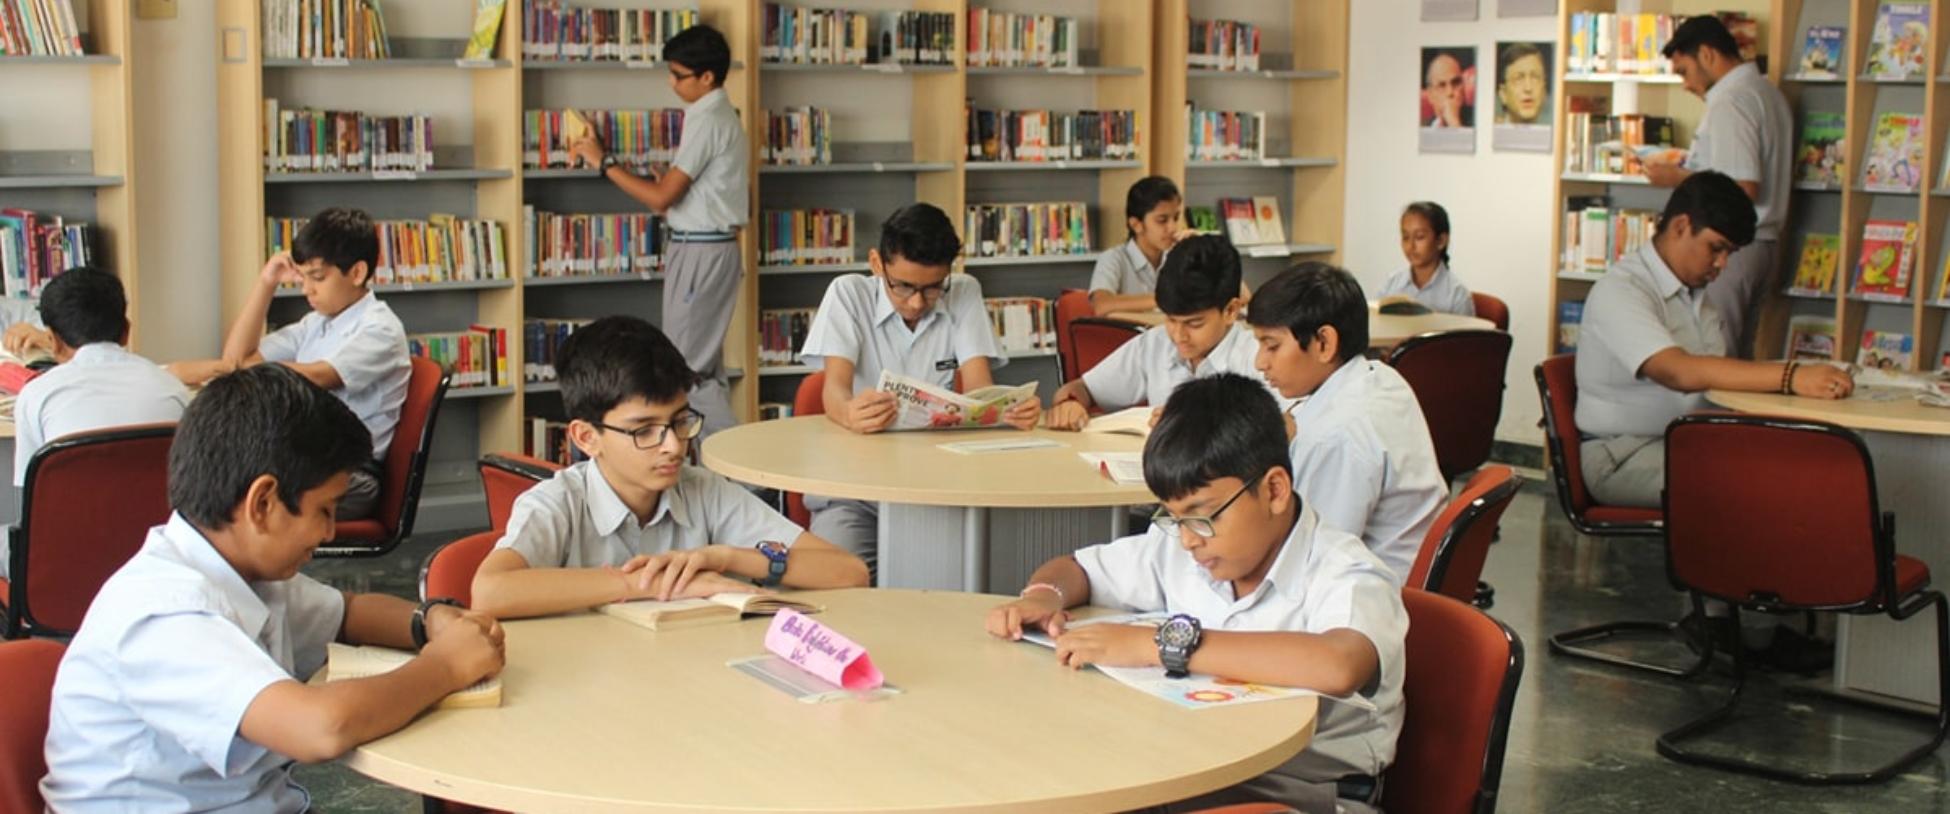 Birla Library